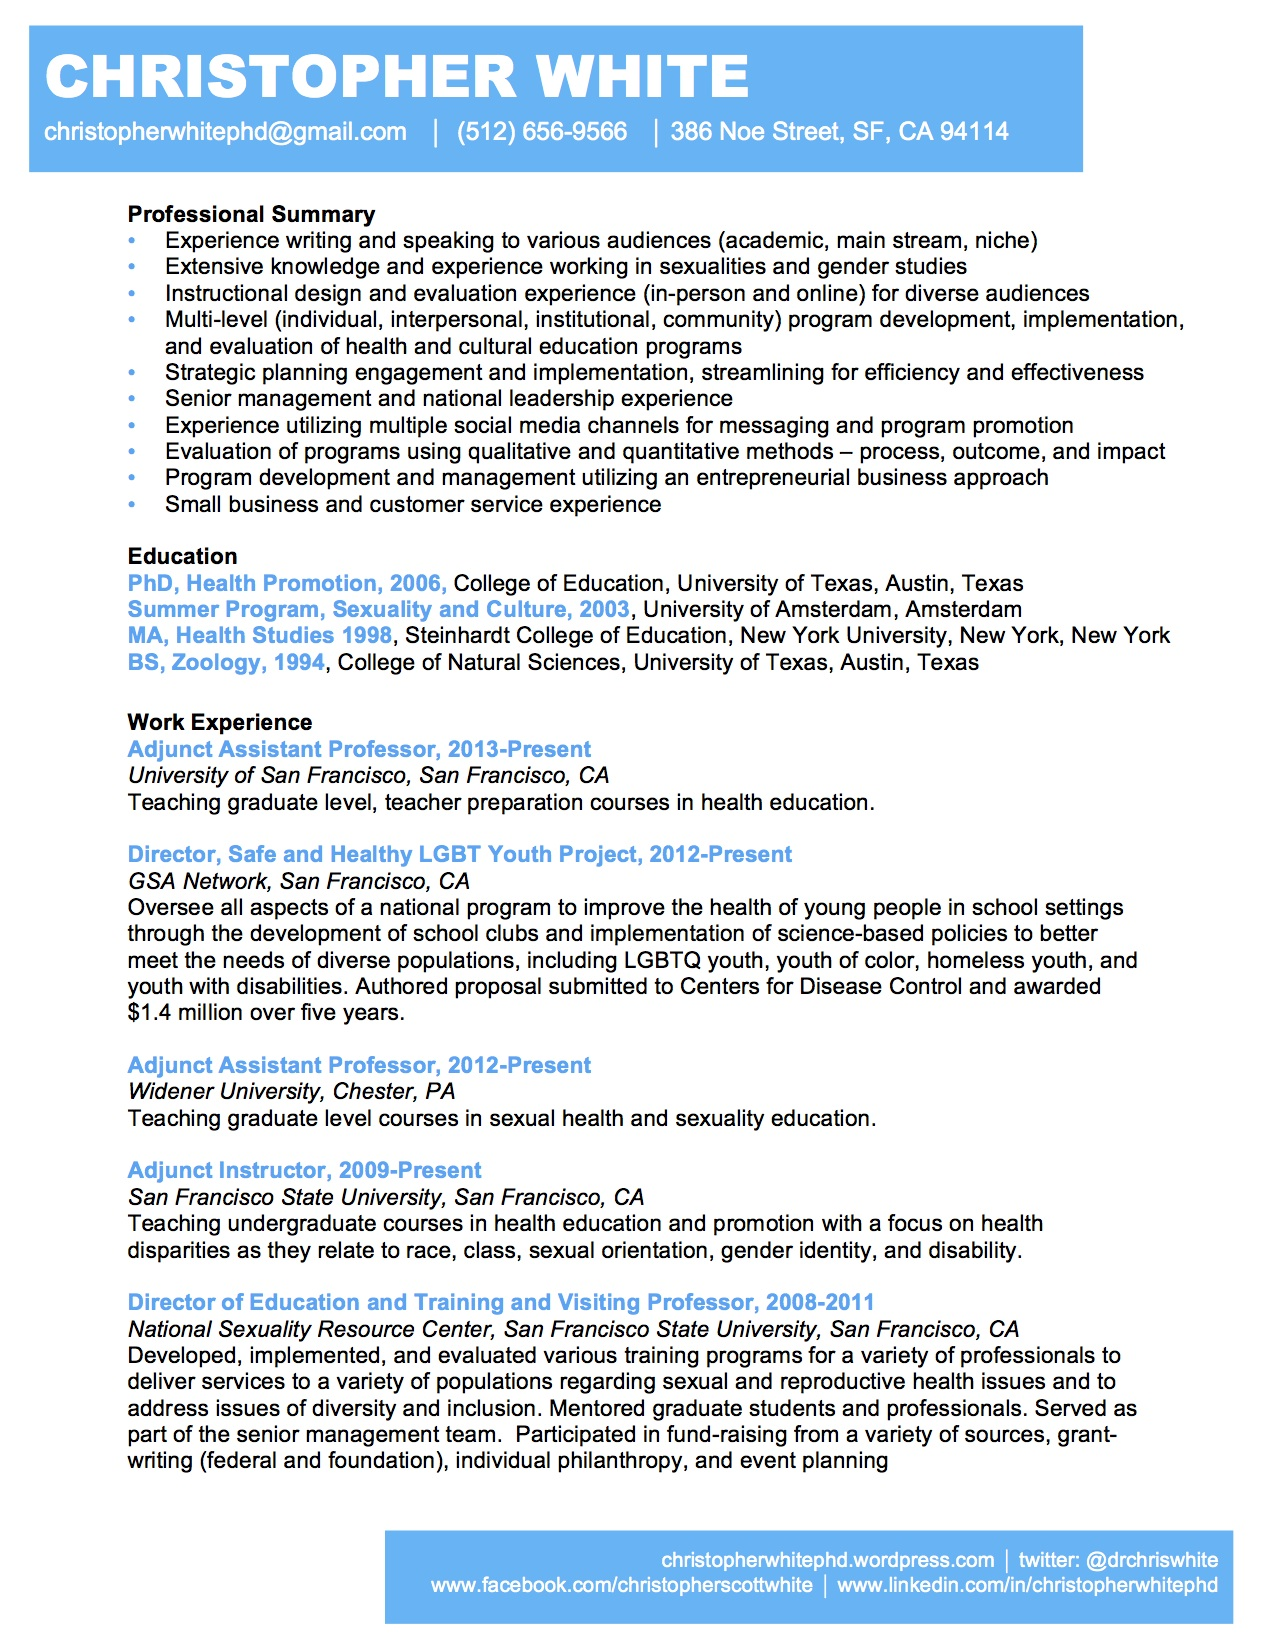 my resume christopher white phd